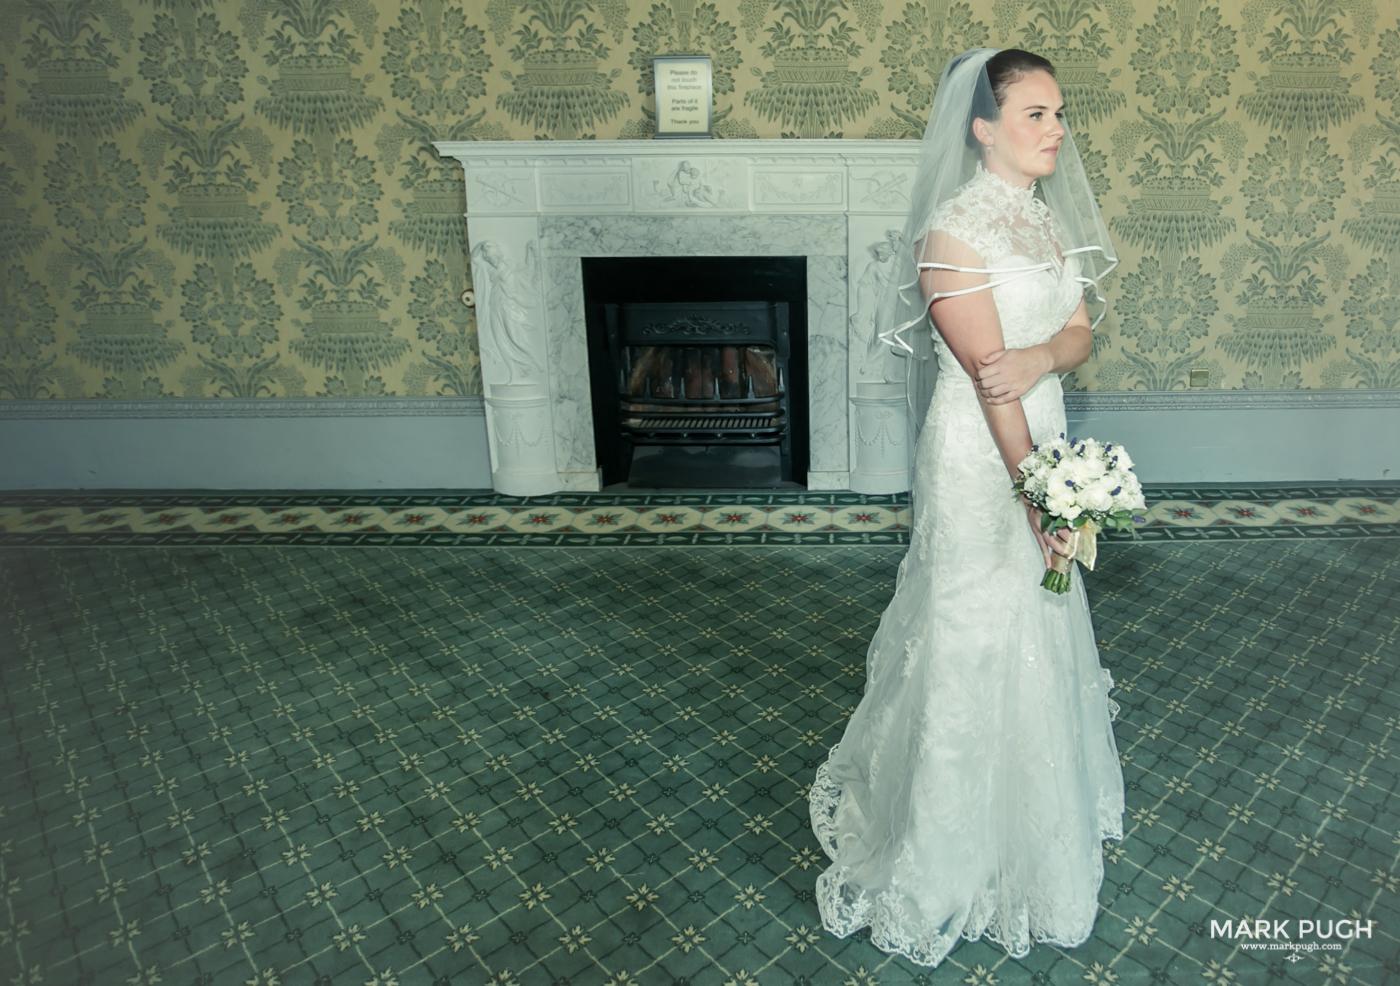 073- Laura and Peter - Wollaton Hall Wedding Nottingham UK by Mark Pugh www.markpugh.com.jpg